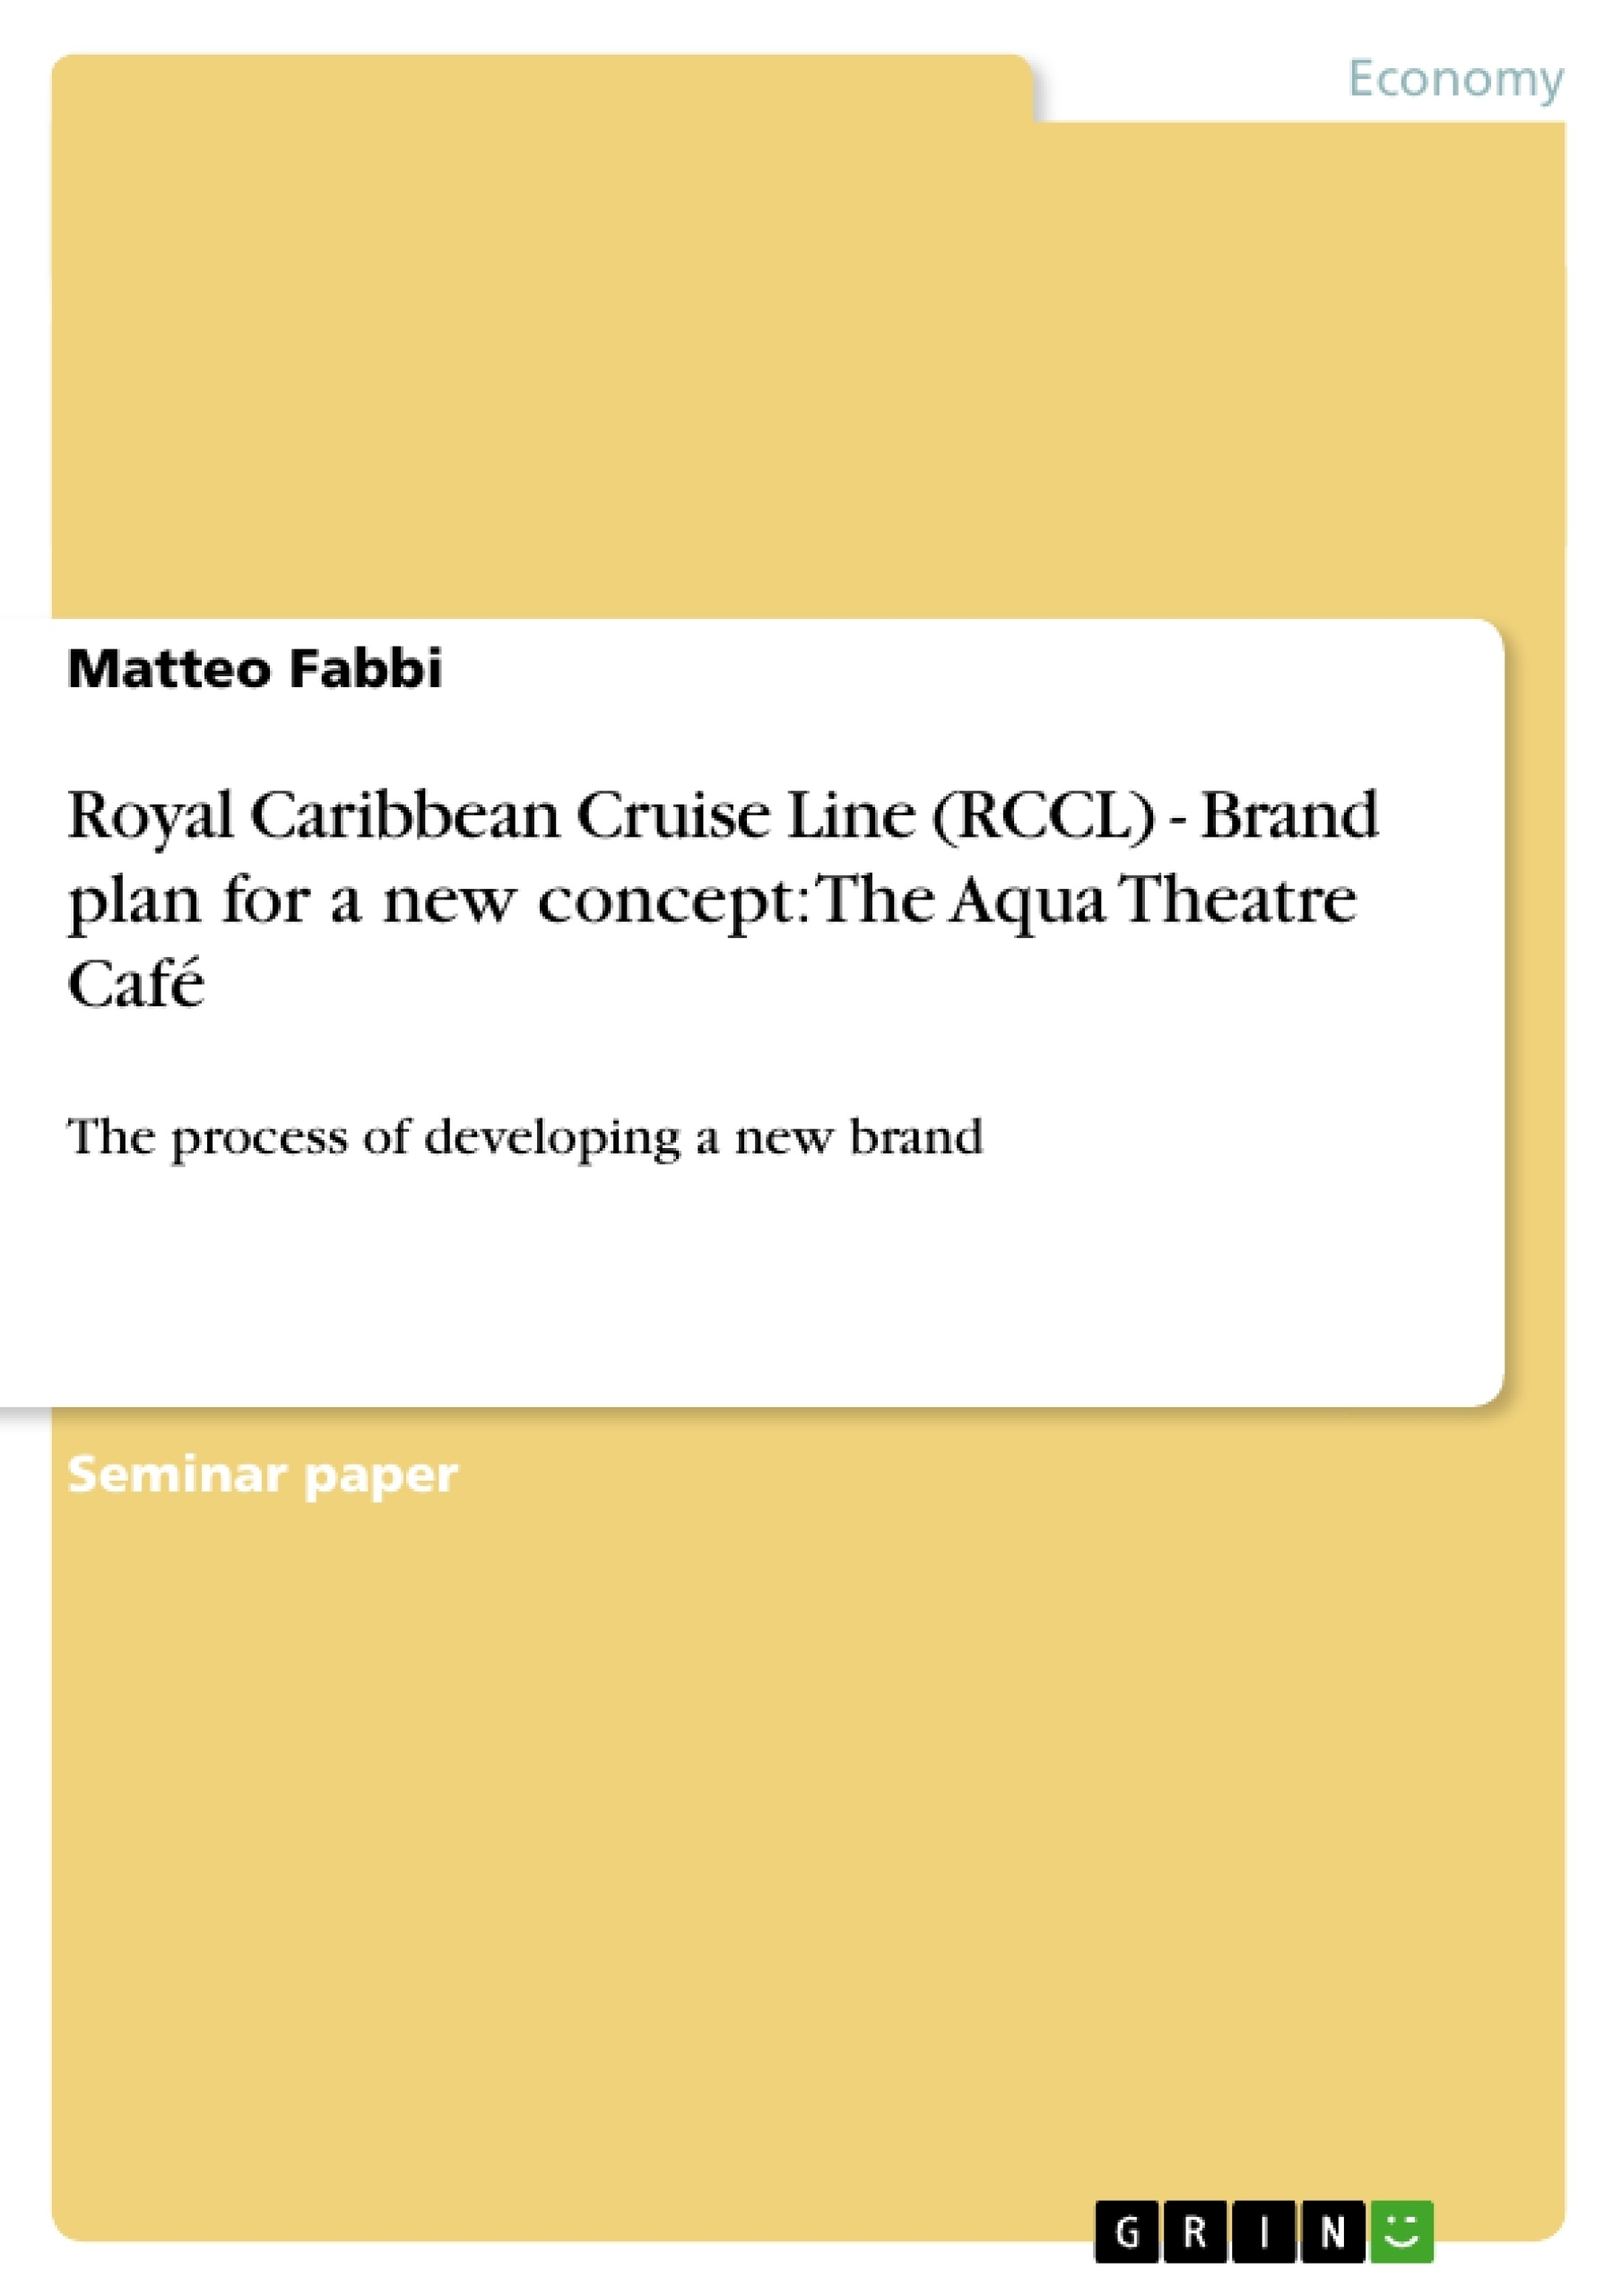 Title: Royal Caribbean Cruise Line (RCCL) - Brand plan for a new concept: The Aqua Theatre Café